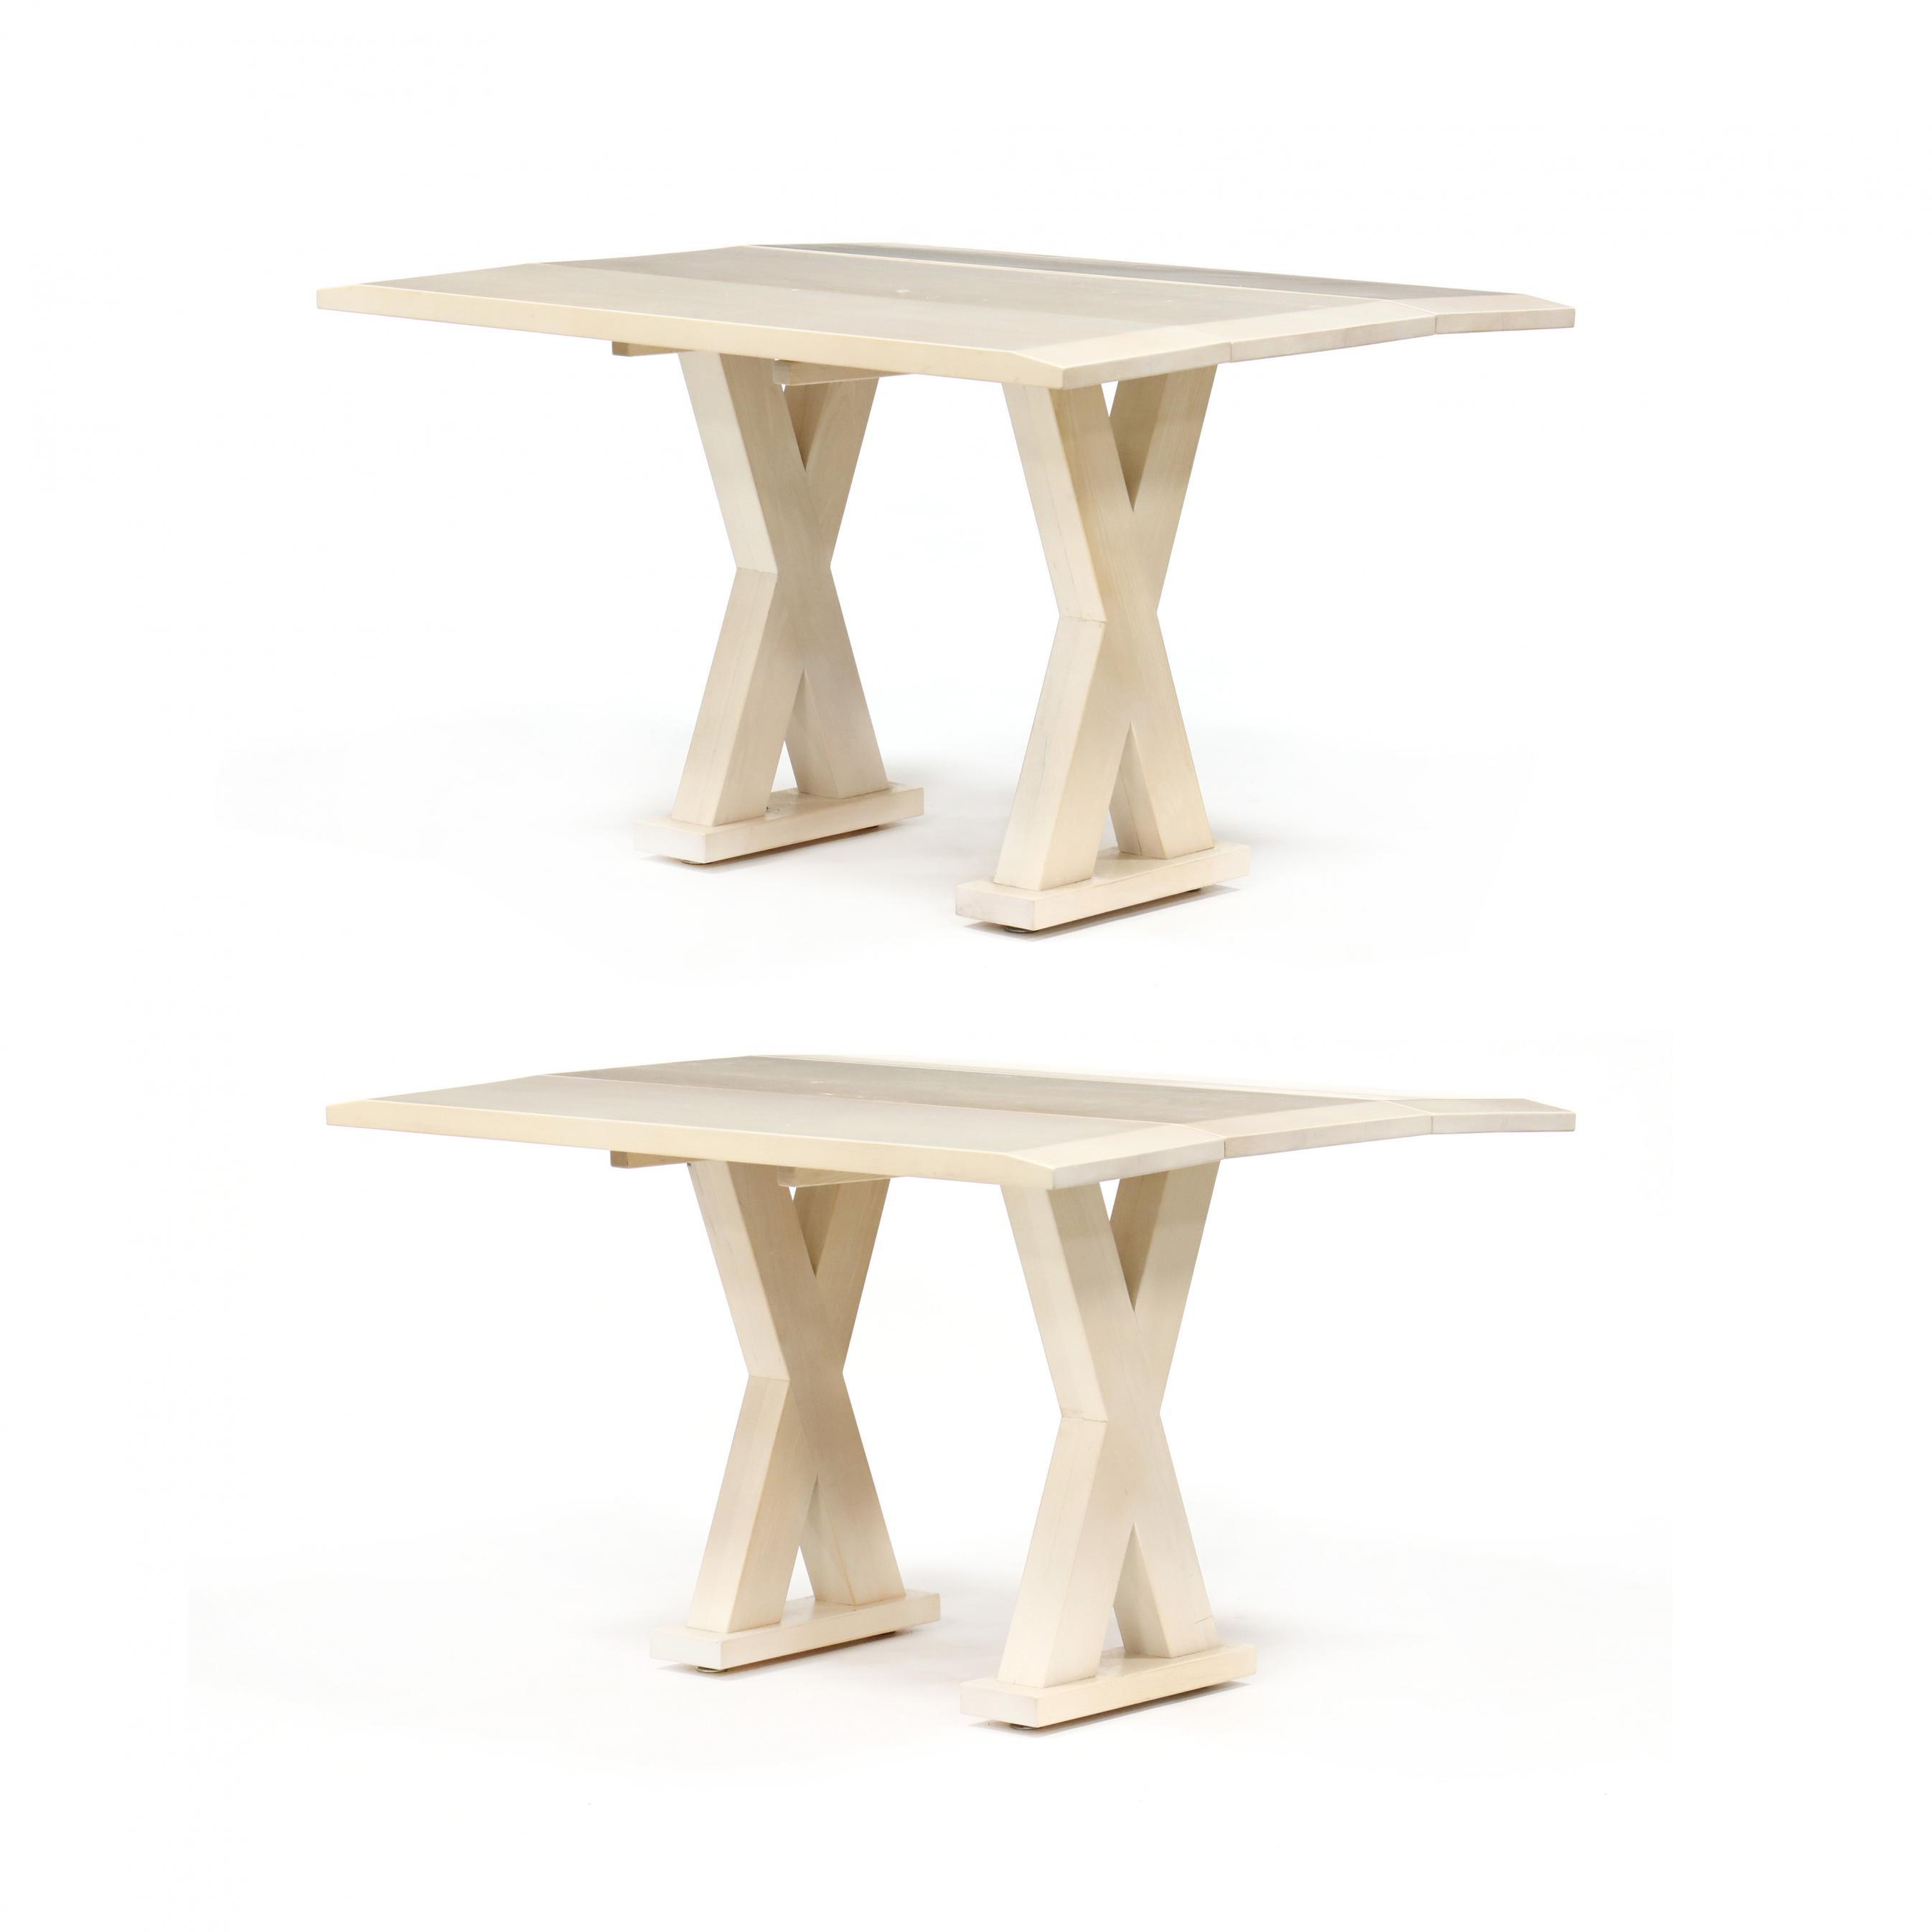 a-pair-of-french-modern-custom-drop-leaf-tables